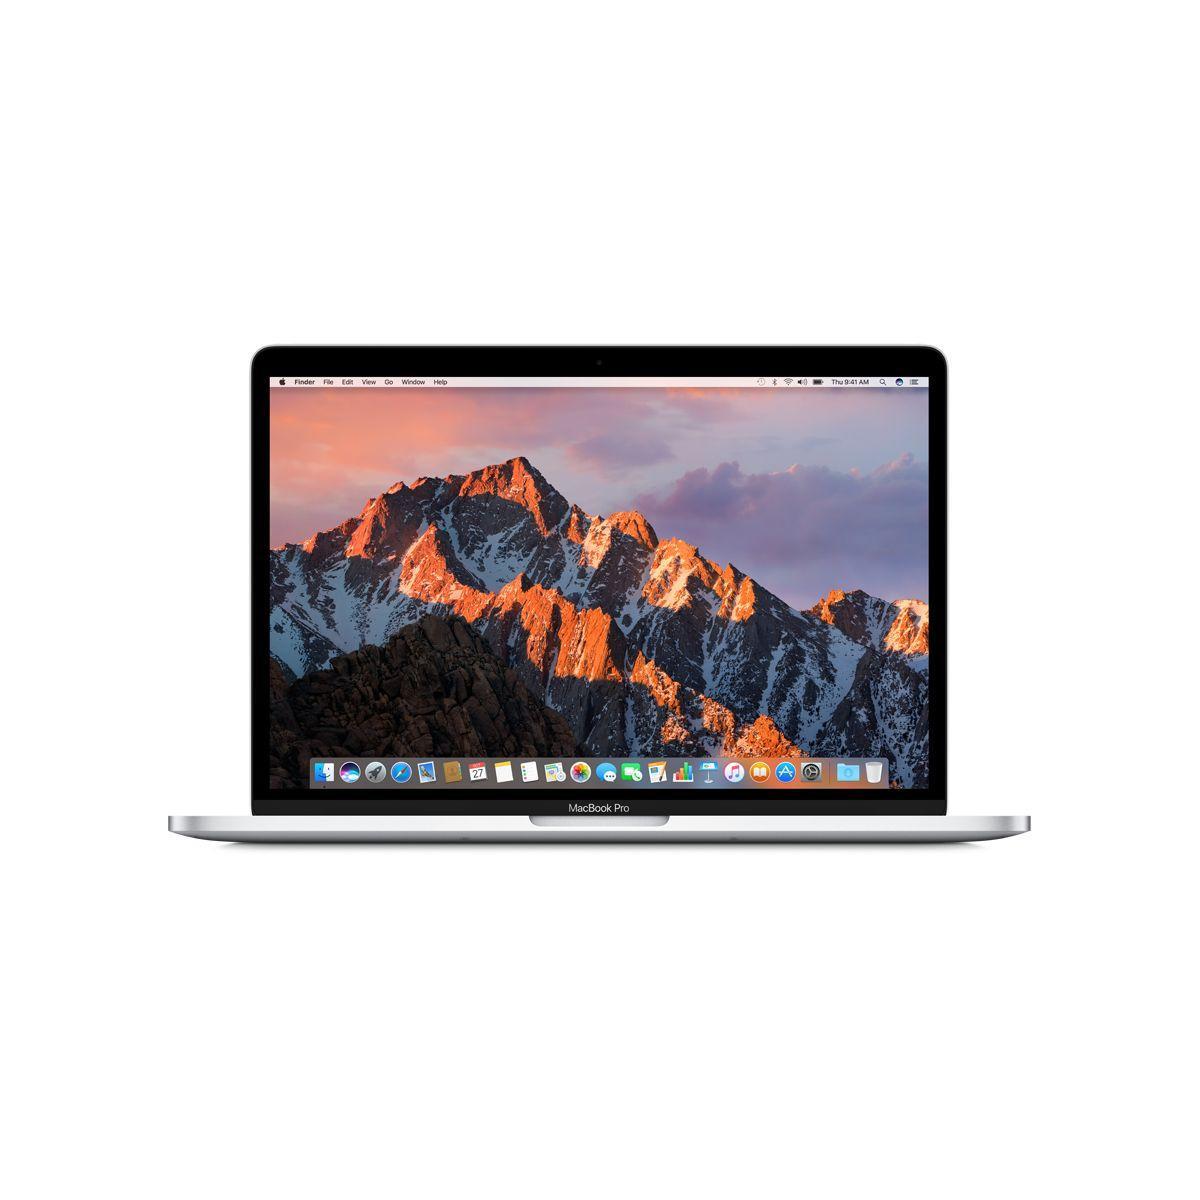 Portable macbook pro 13 i5 256go argent (photo)